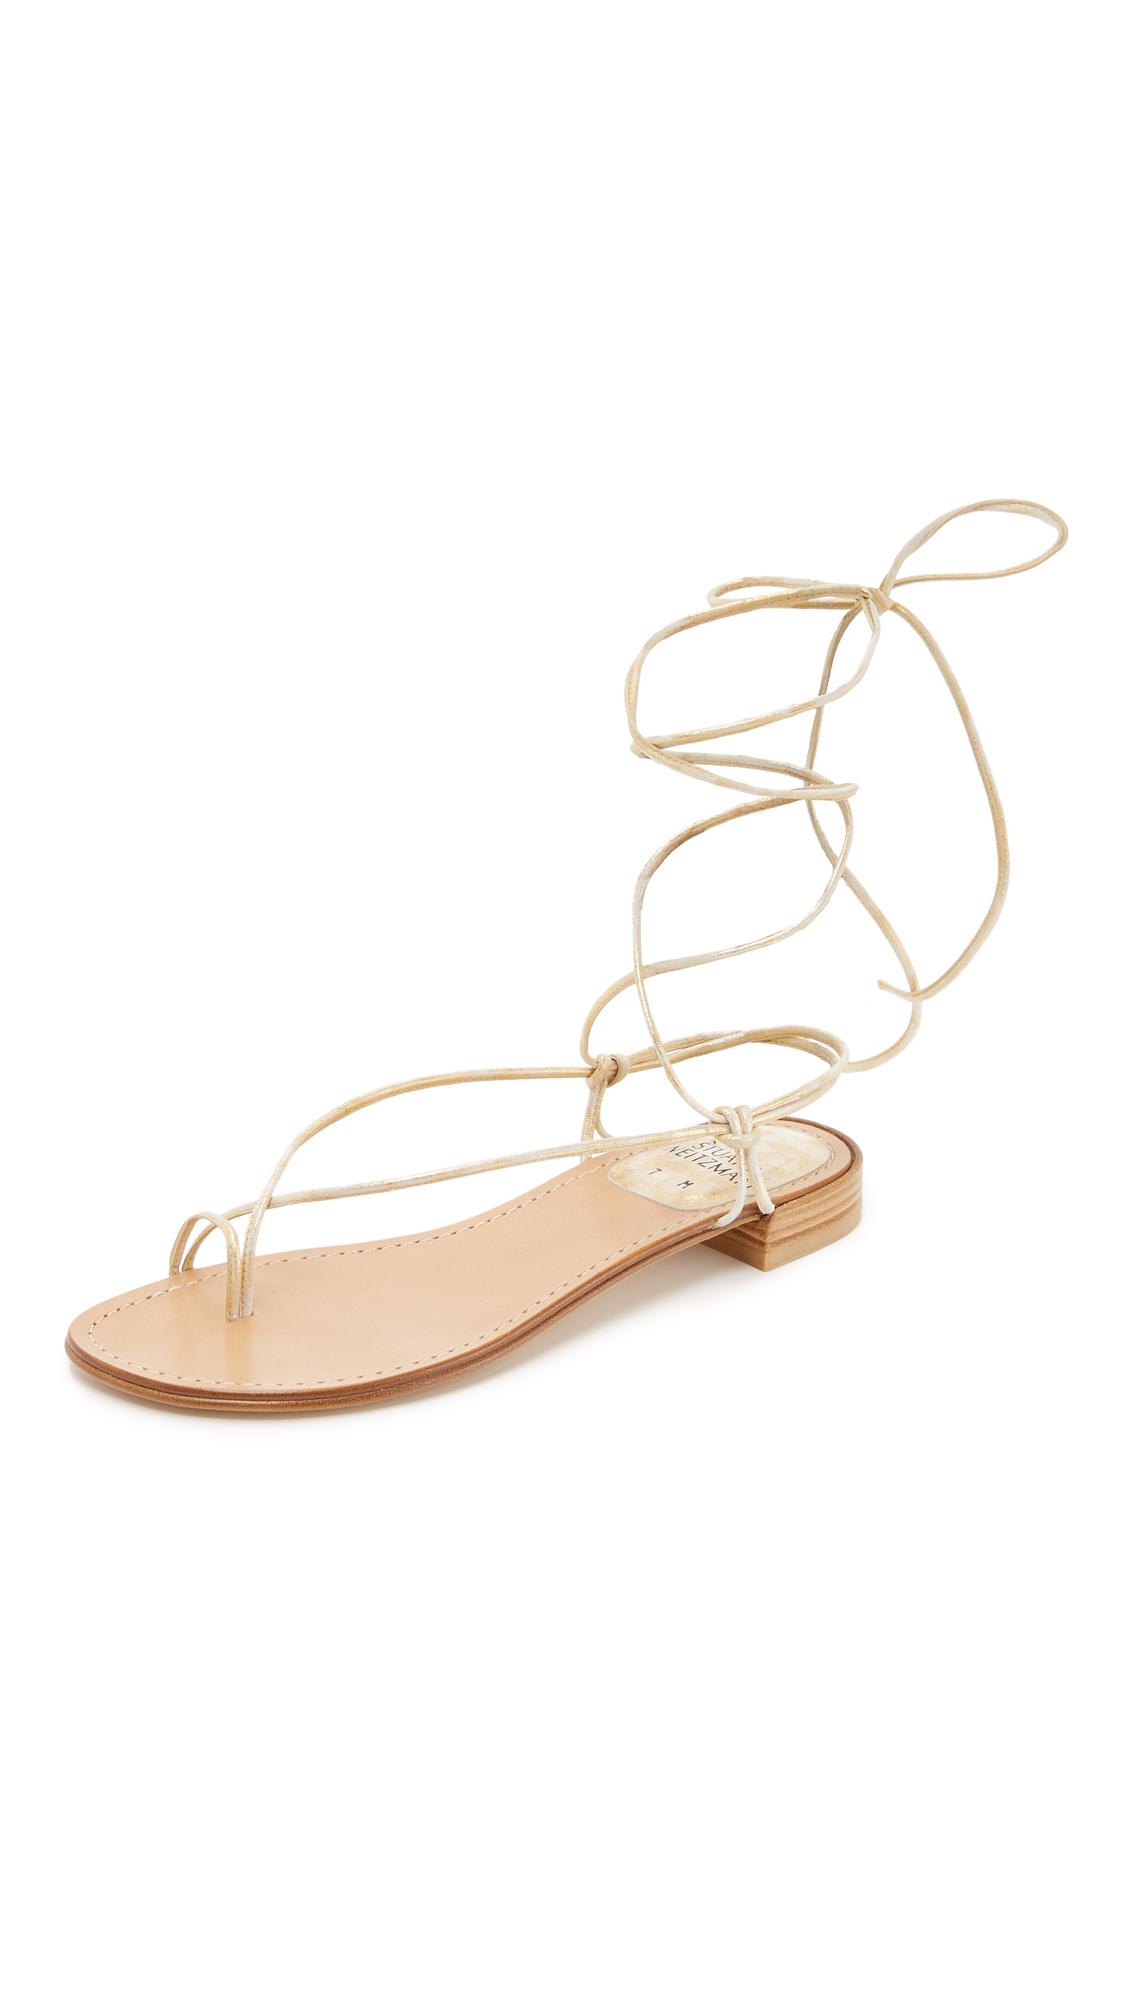 431f74614 Lyst - Stuart Weitzman Nieta Sandals in Metallic